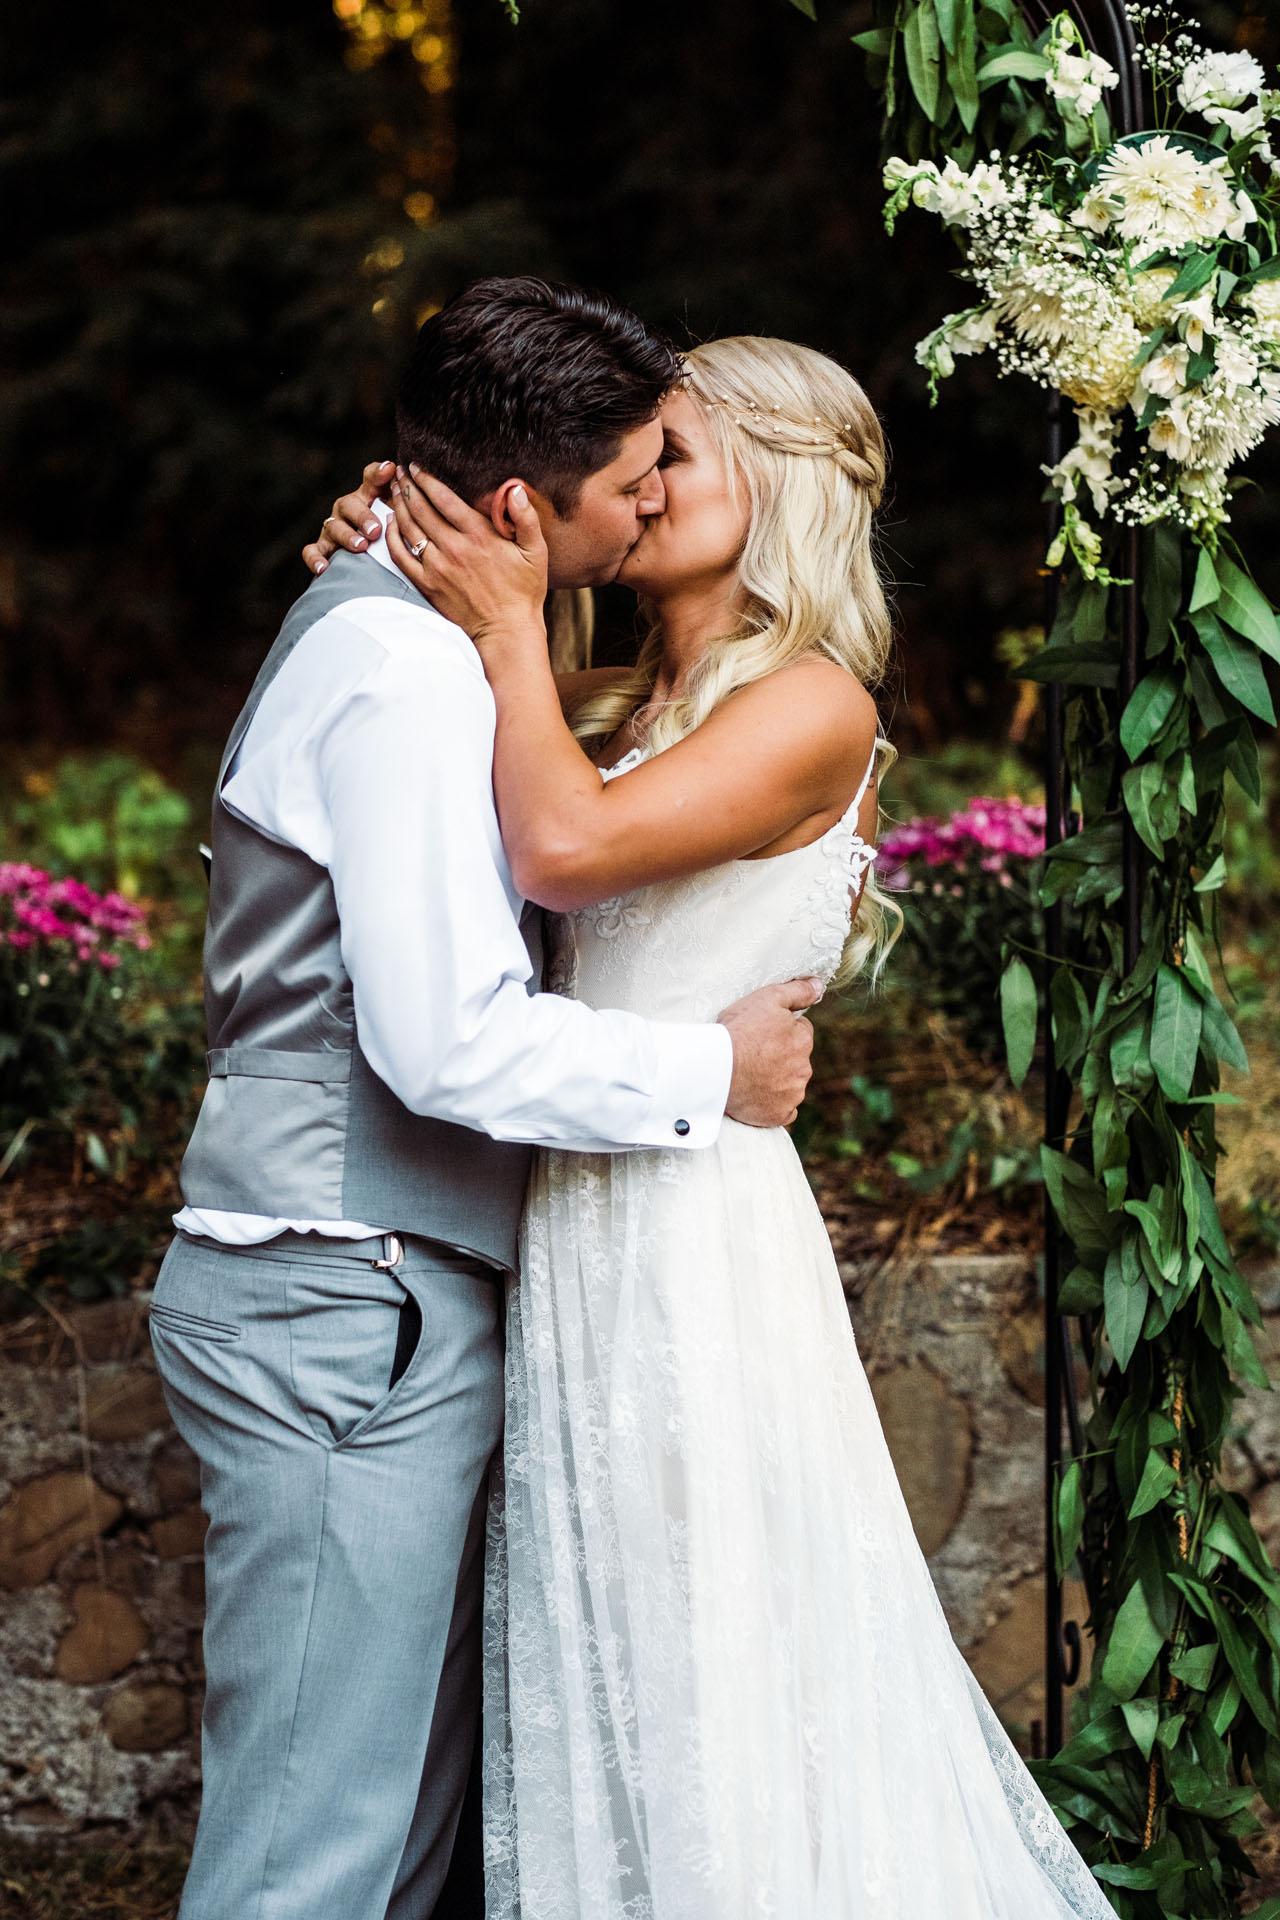 10-7-17 Devon and Jordan's Wedding-113.jpg